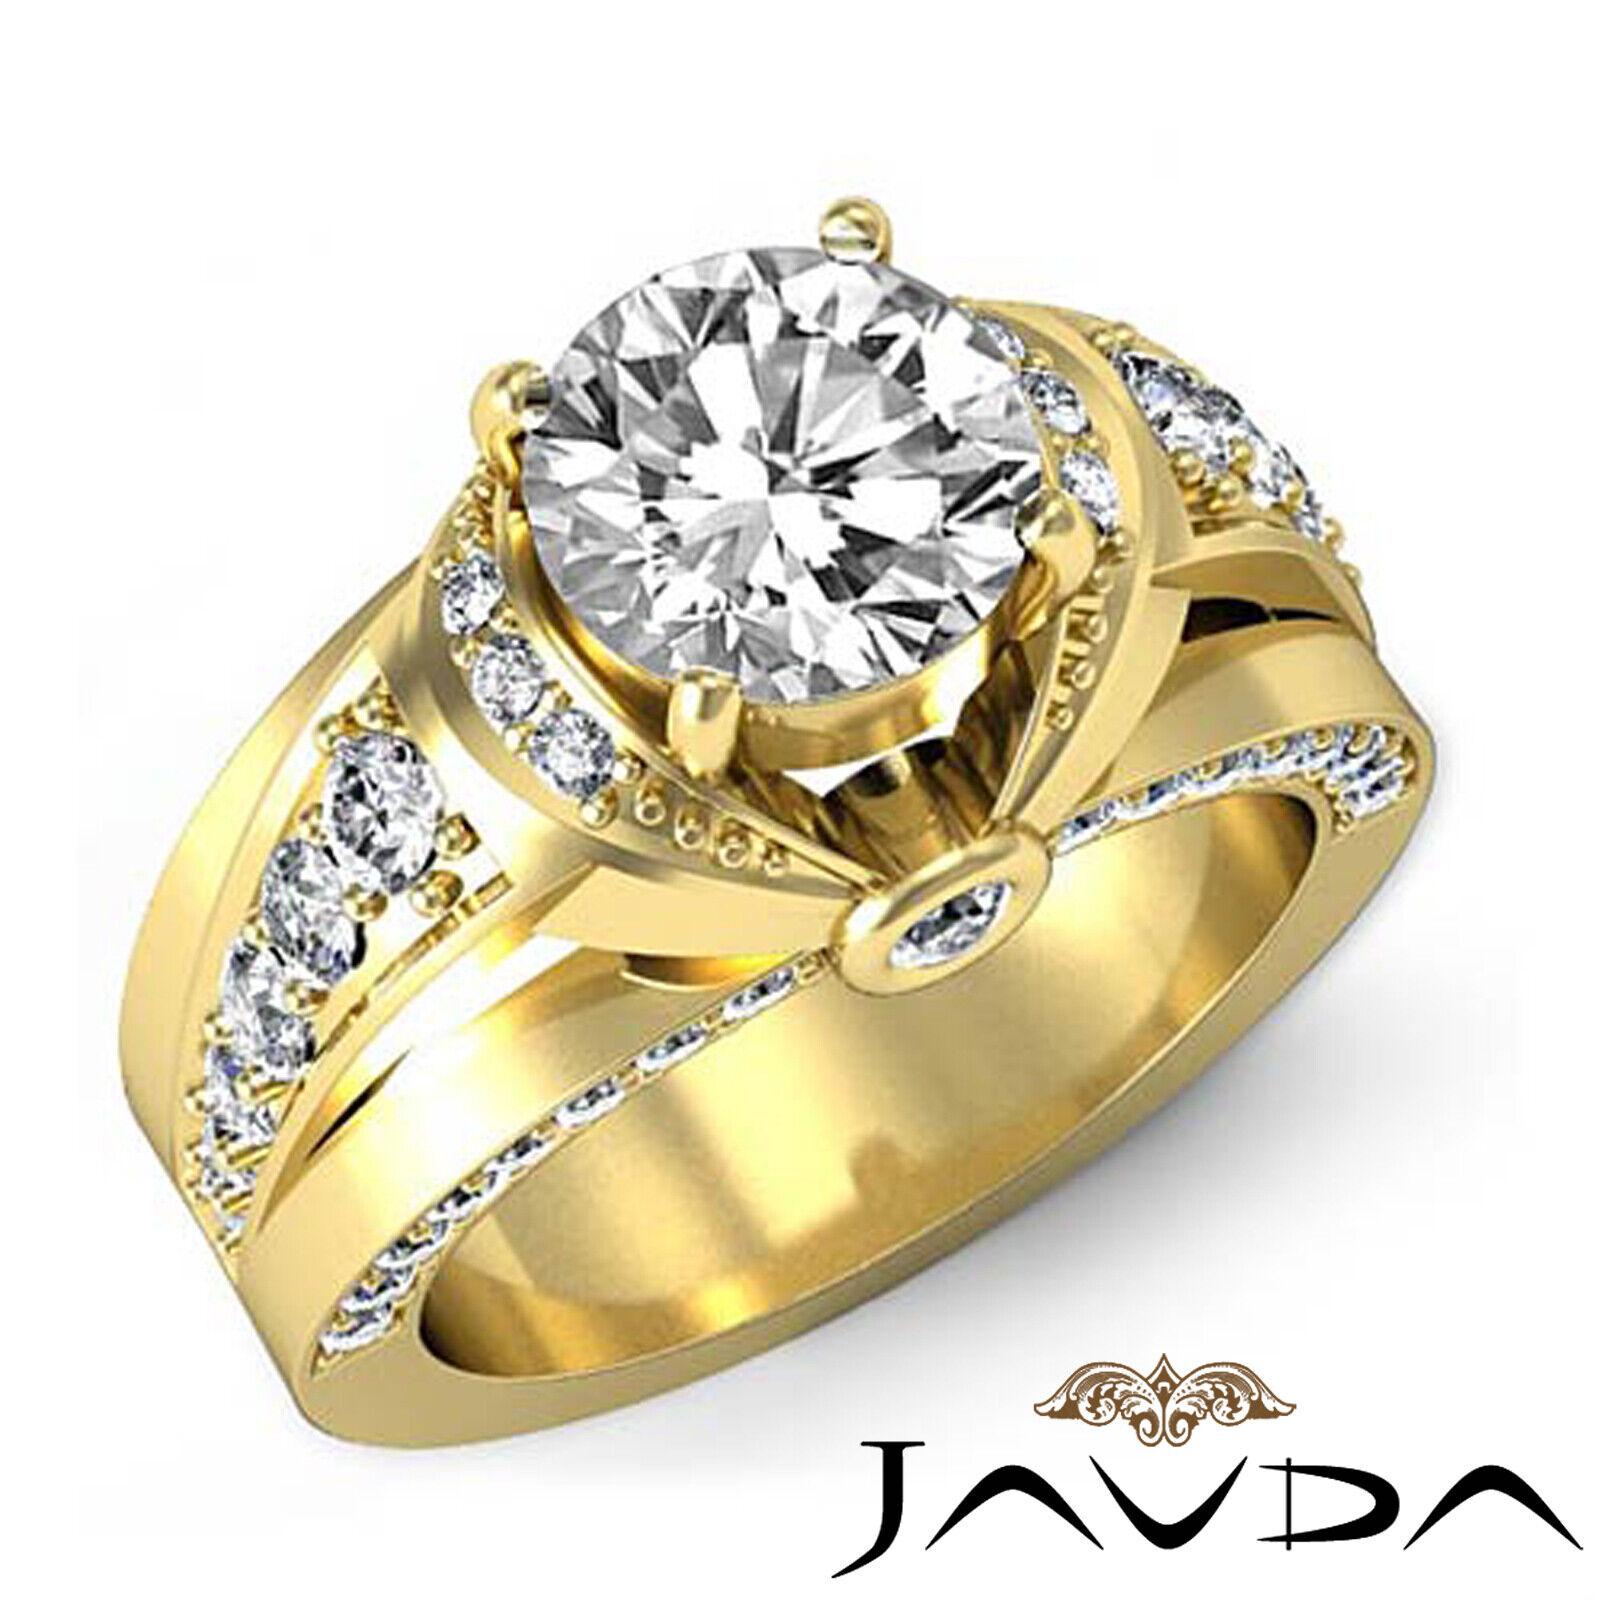 1.7ct Knot Classic Sidestone Round Diamond Engagement Ring GIA H-VVS2 White Gold 7